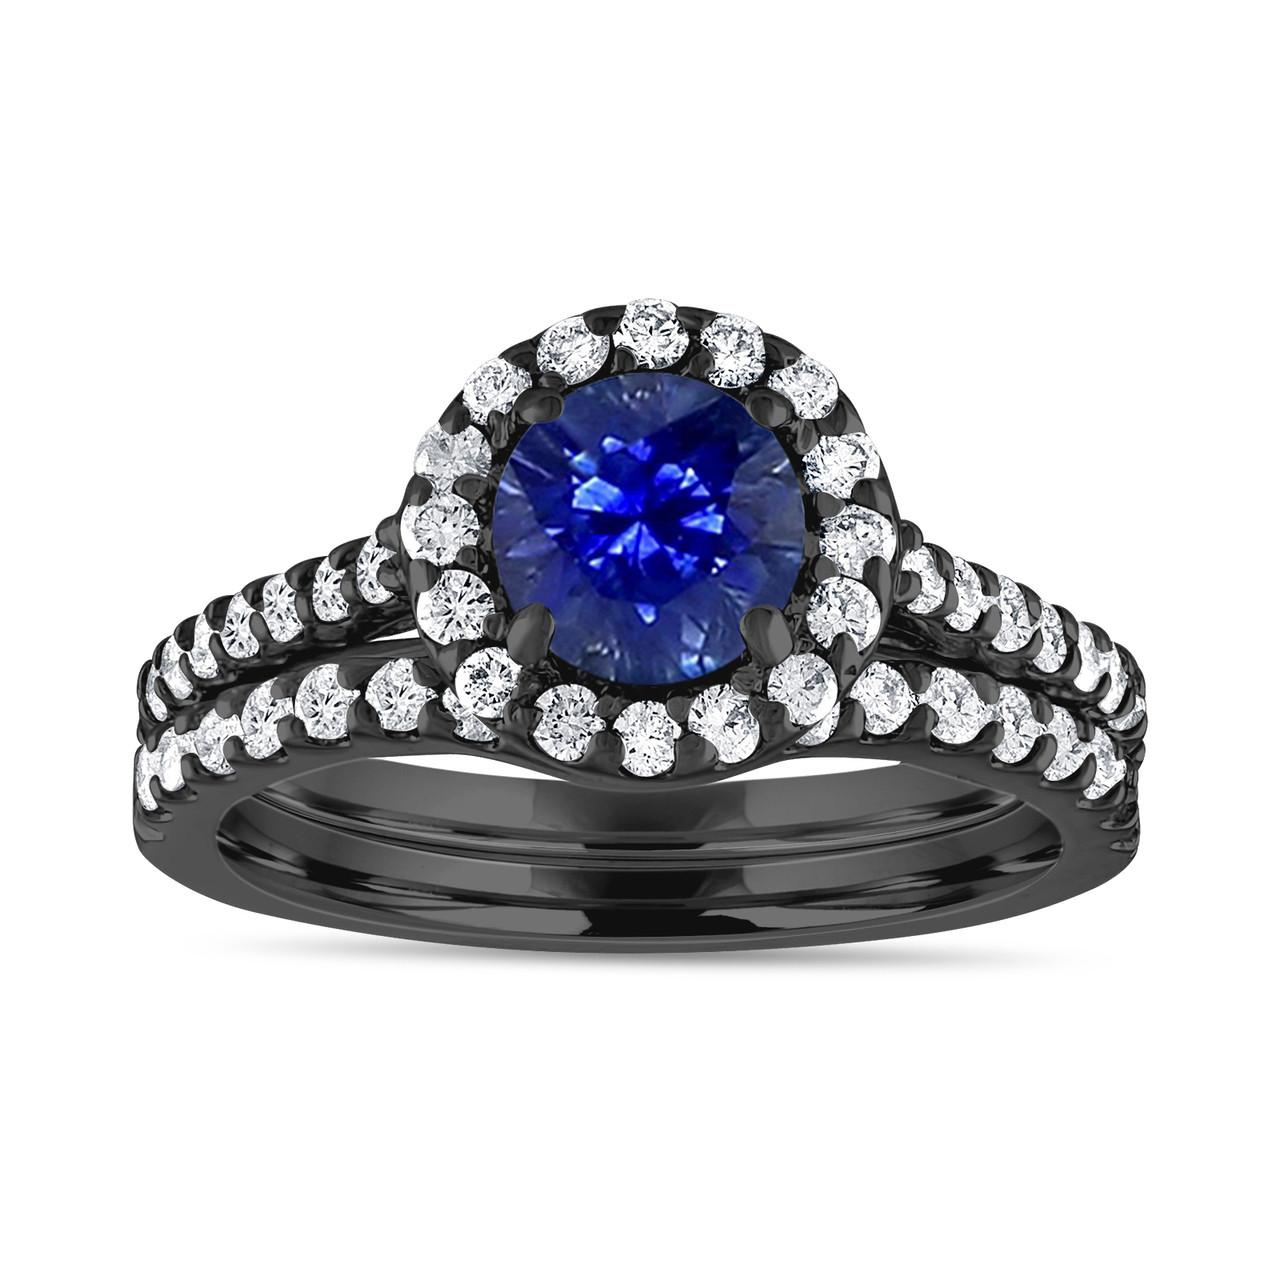 Vintage Shire Engagement Ring Set Diamond Bridal Sets Blue Wedding 1 83 Carat 14k